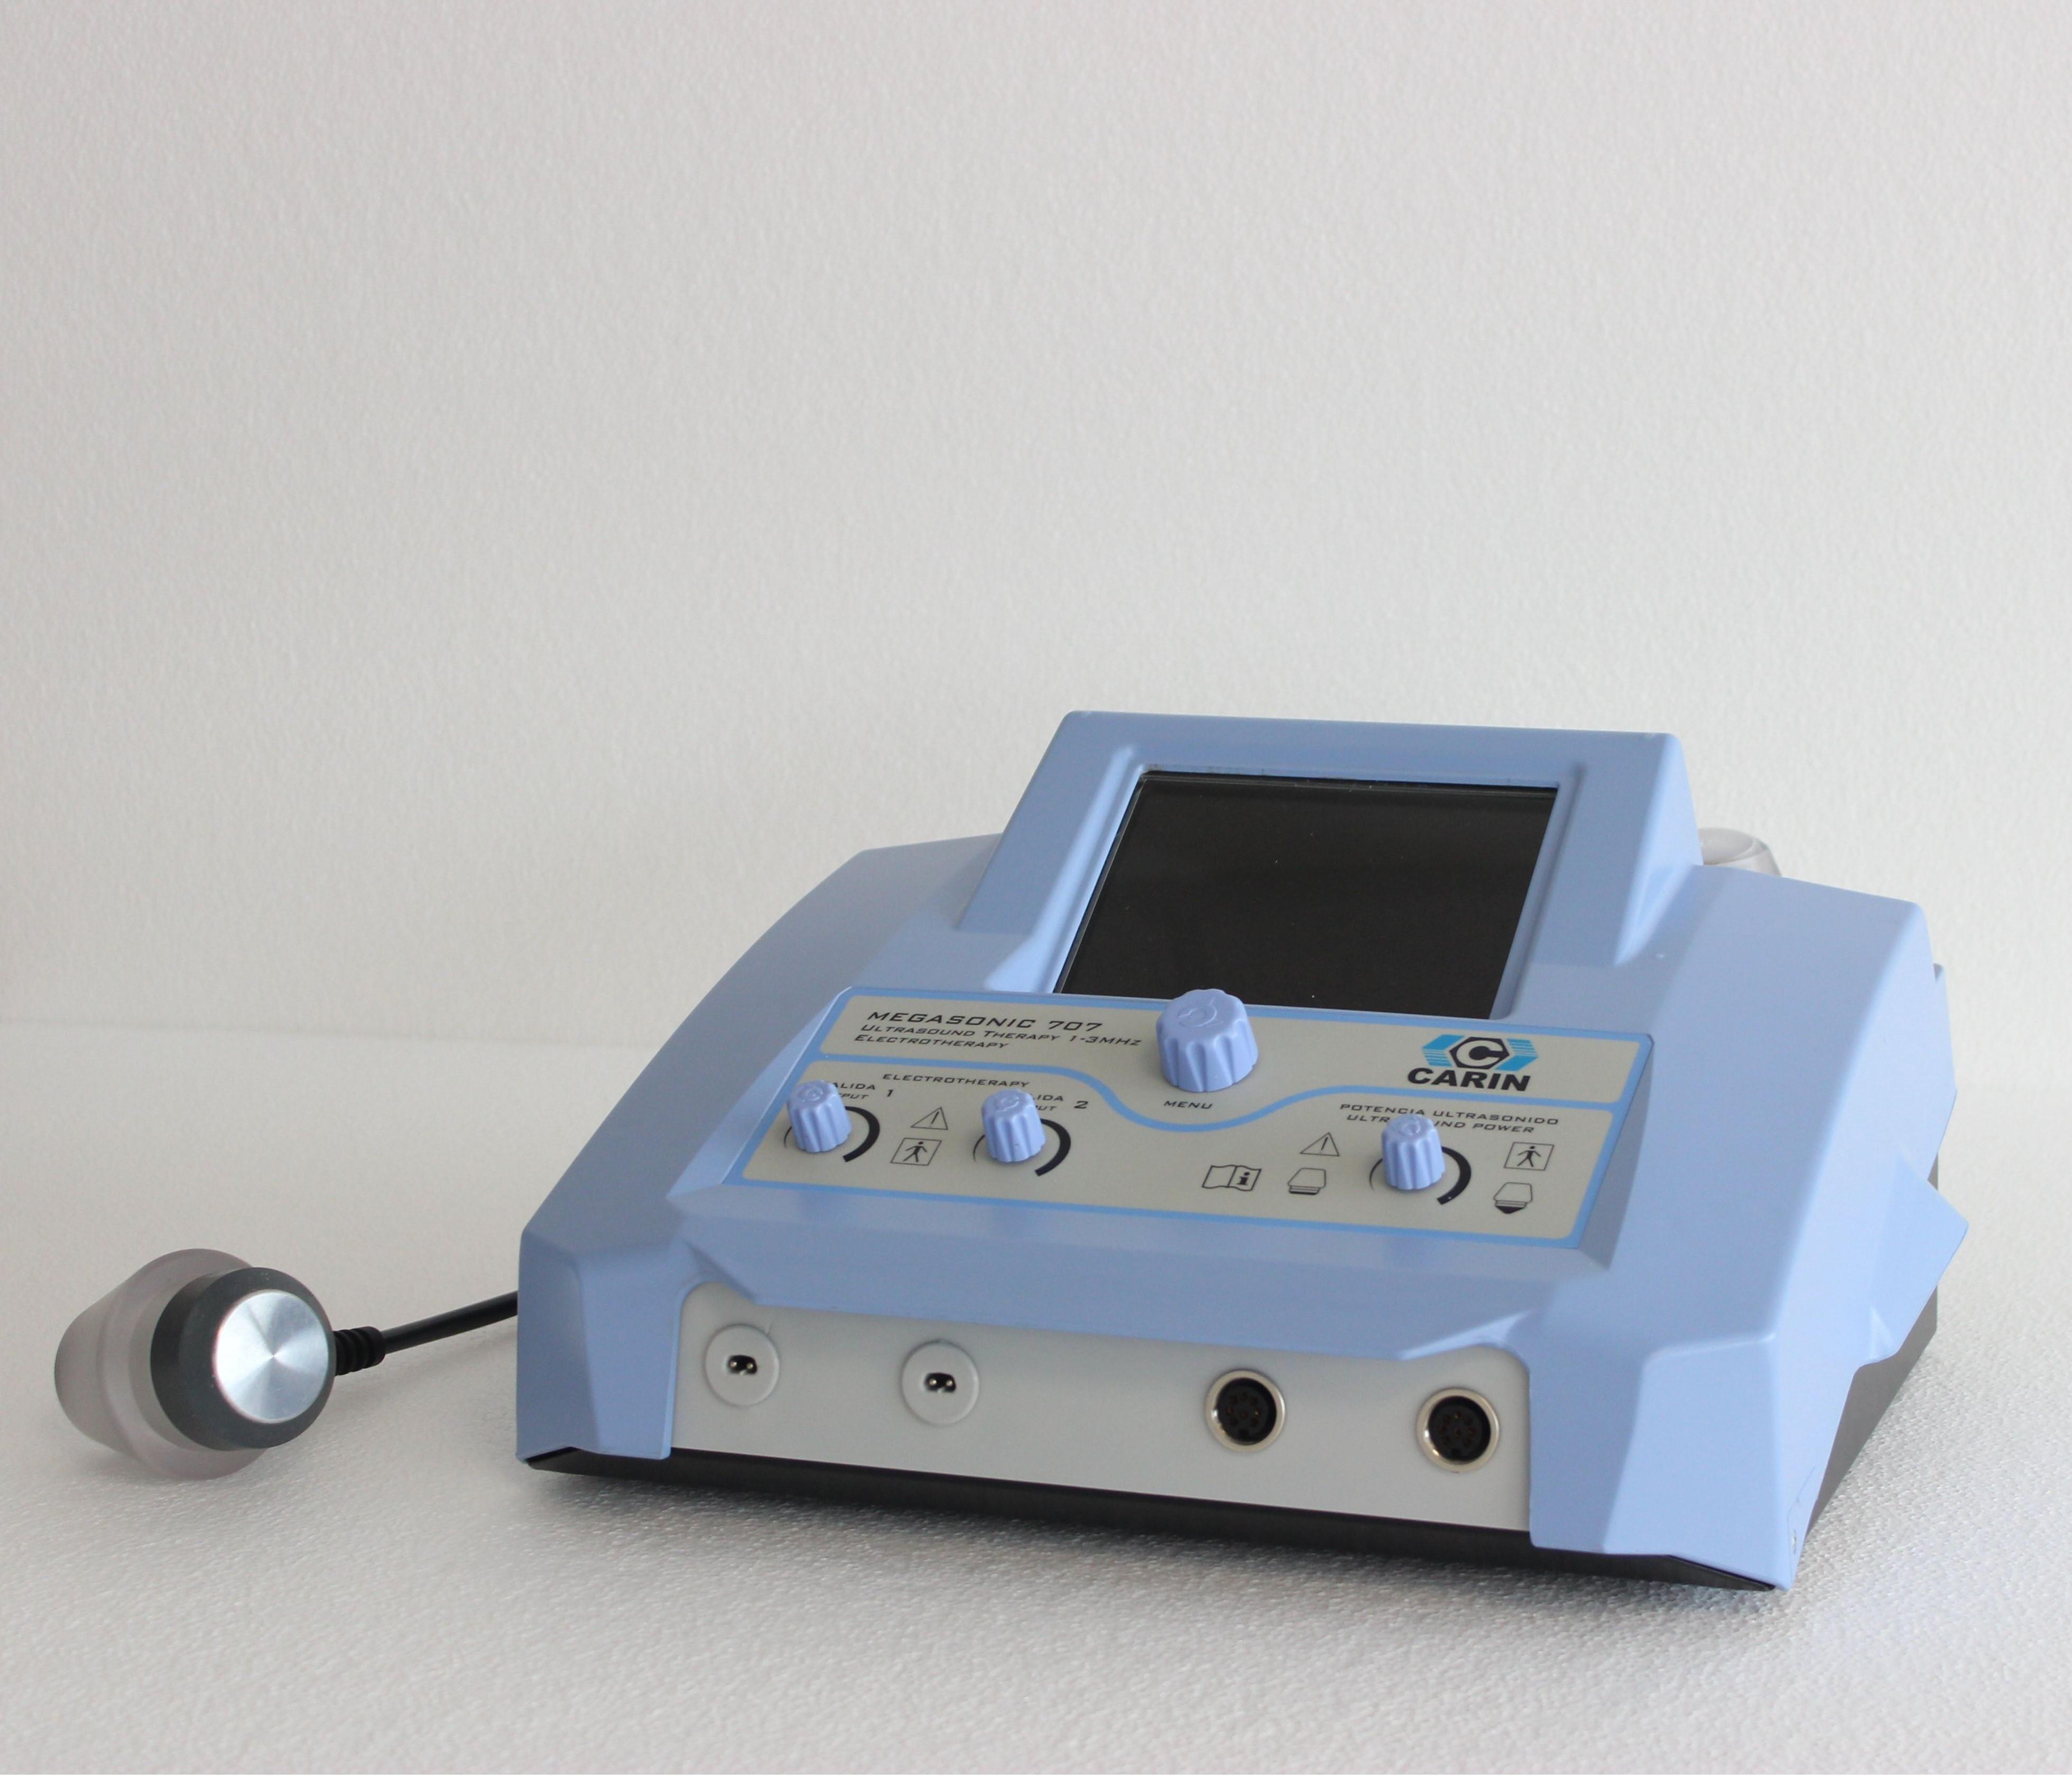 Megasonic 707 _1.JPG